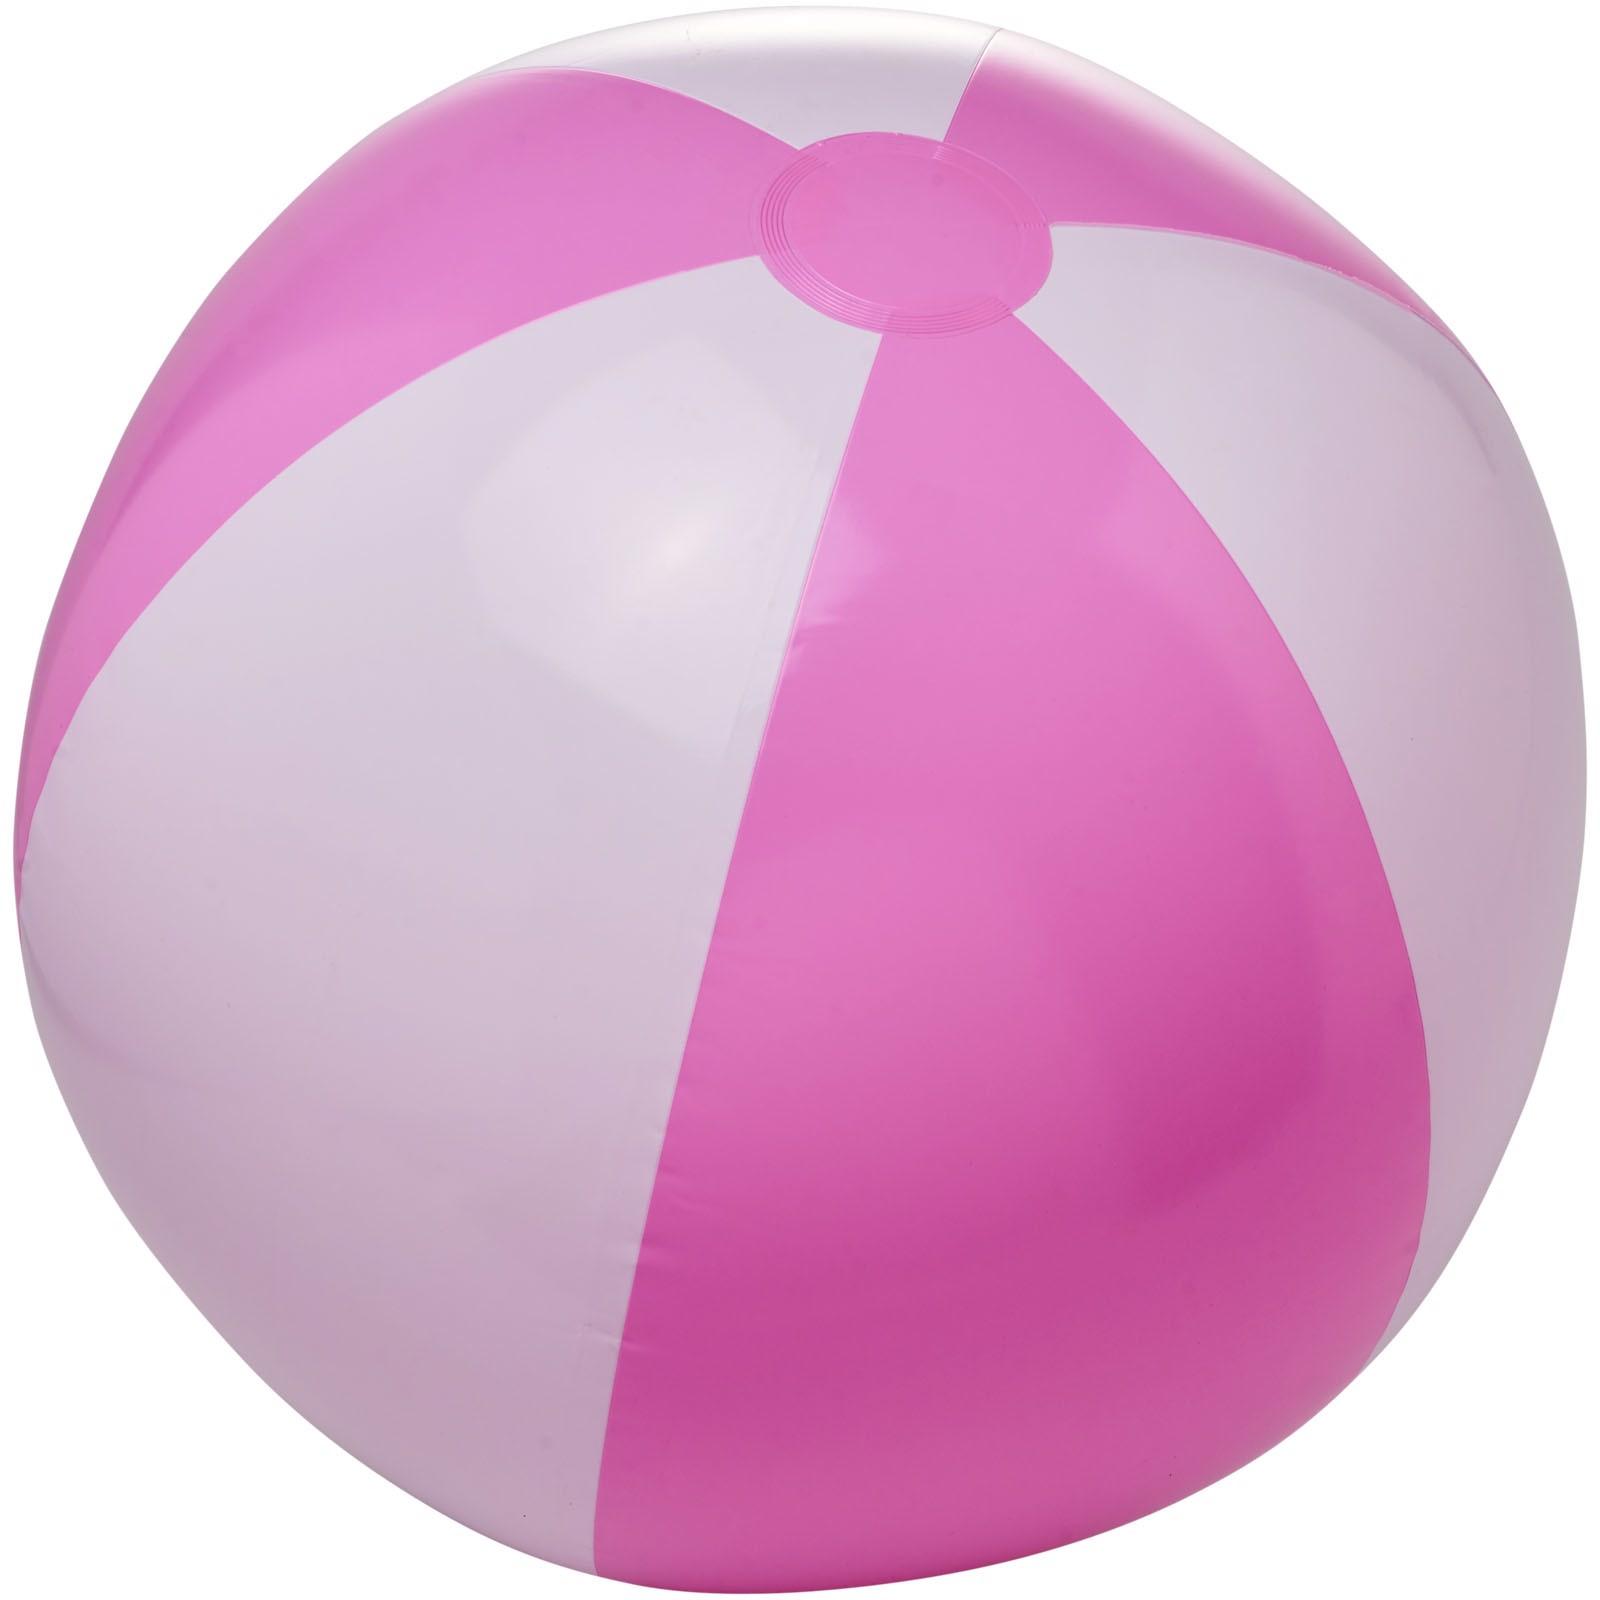 Bora Wasserball - Rosa / Weiss